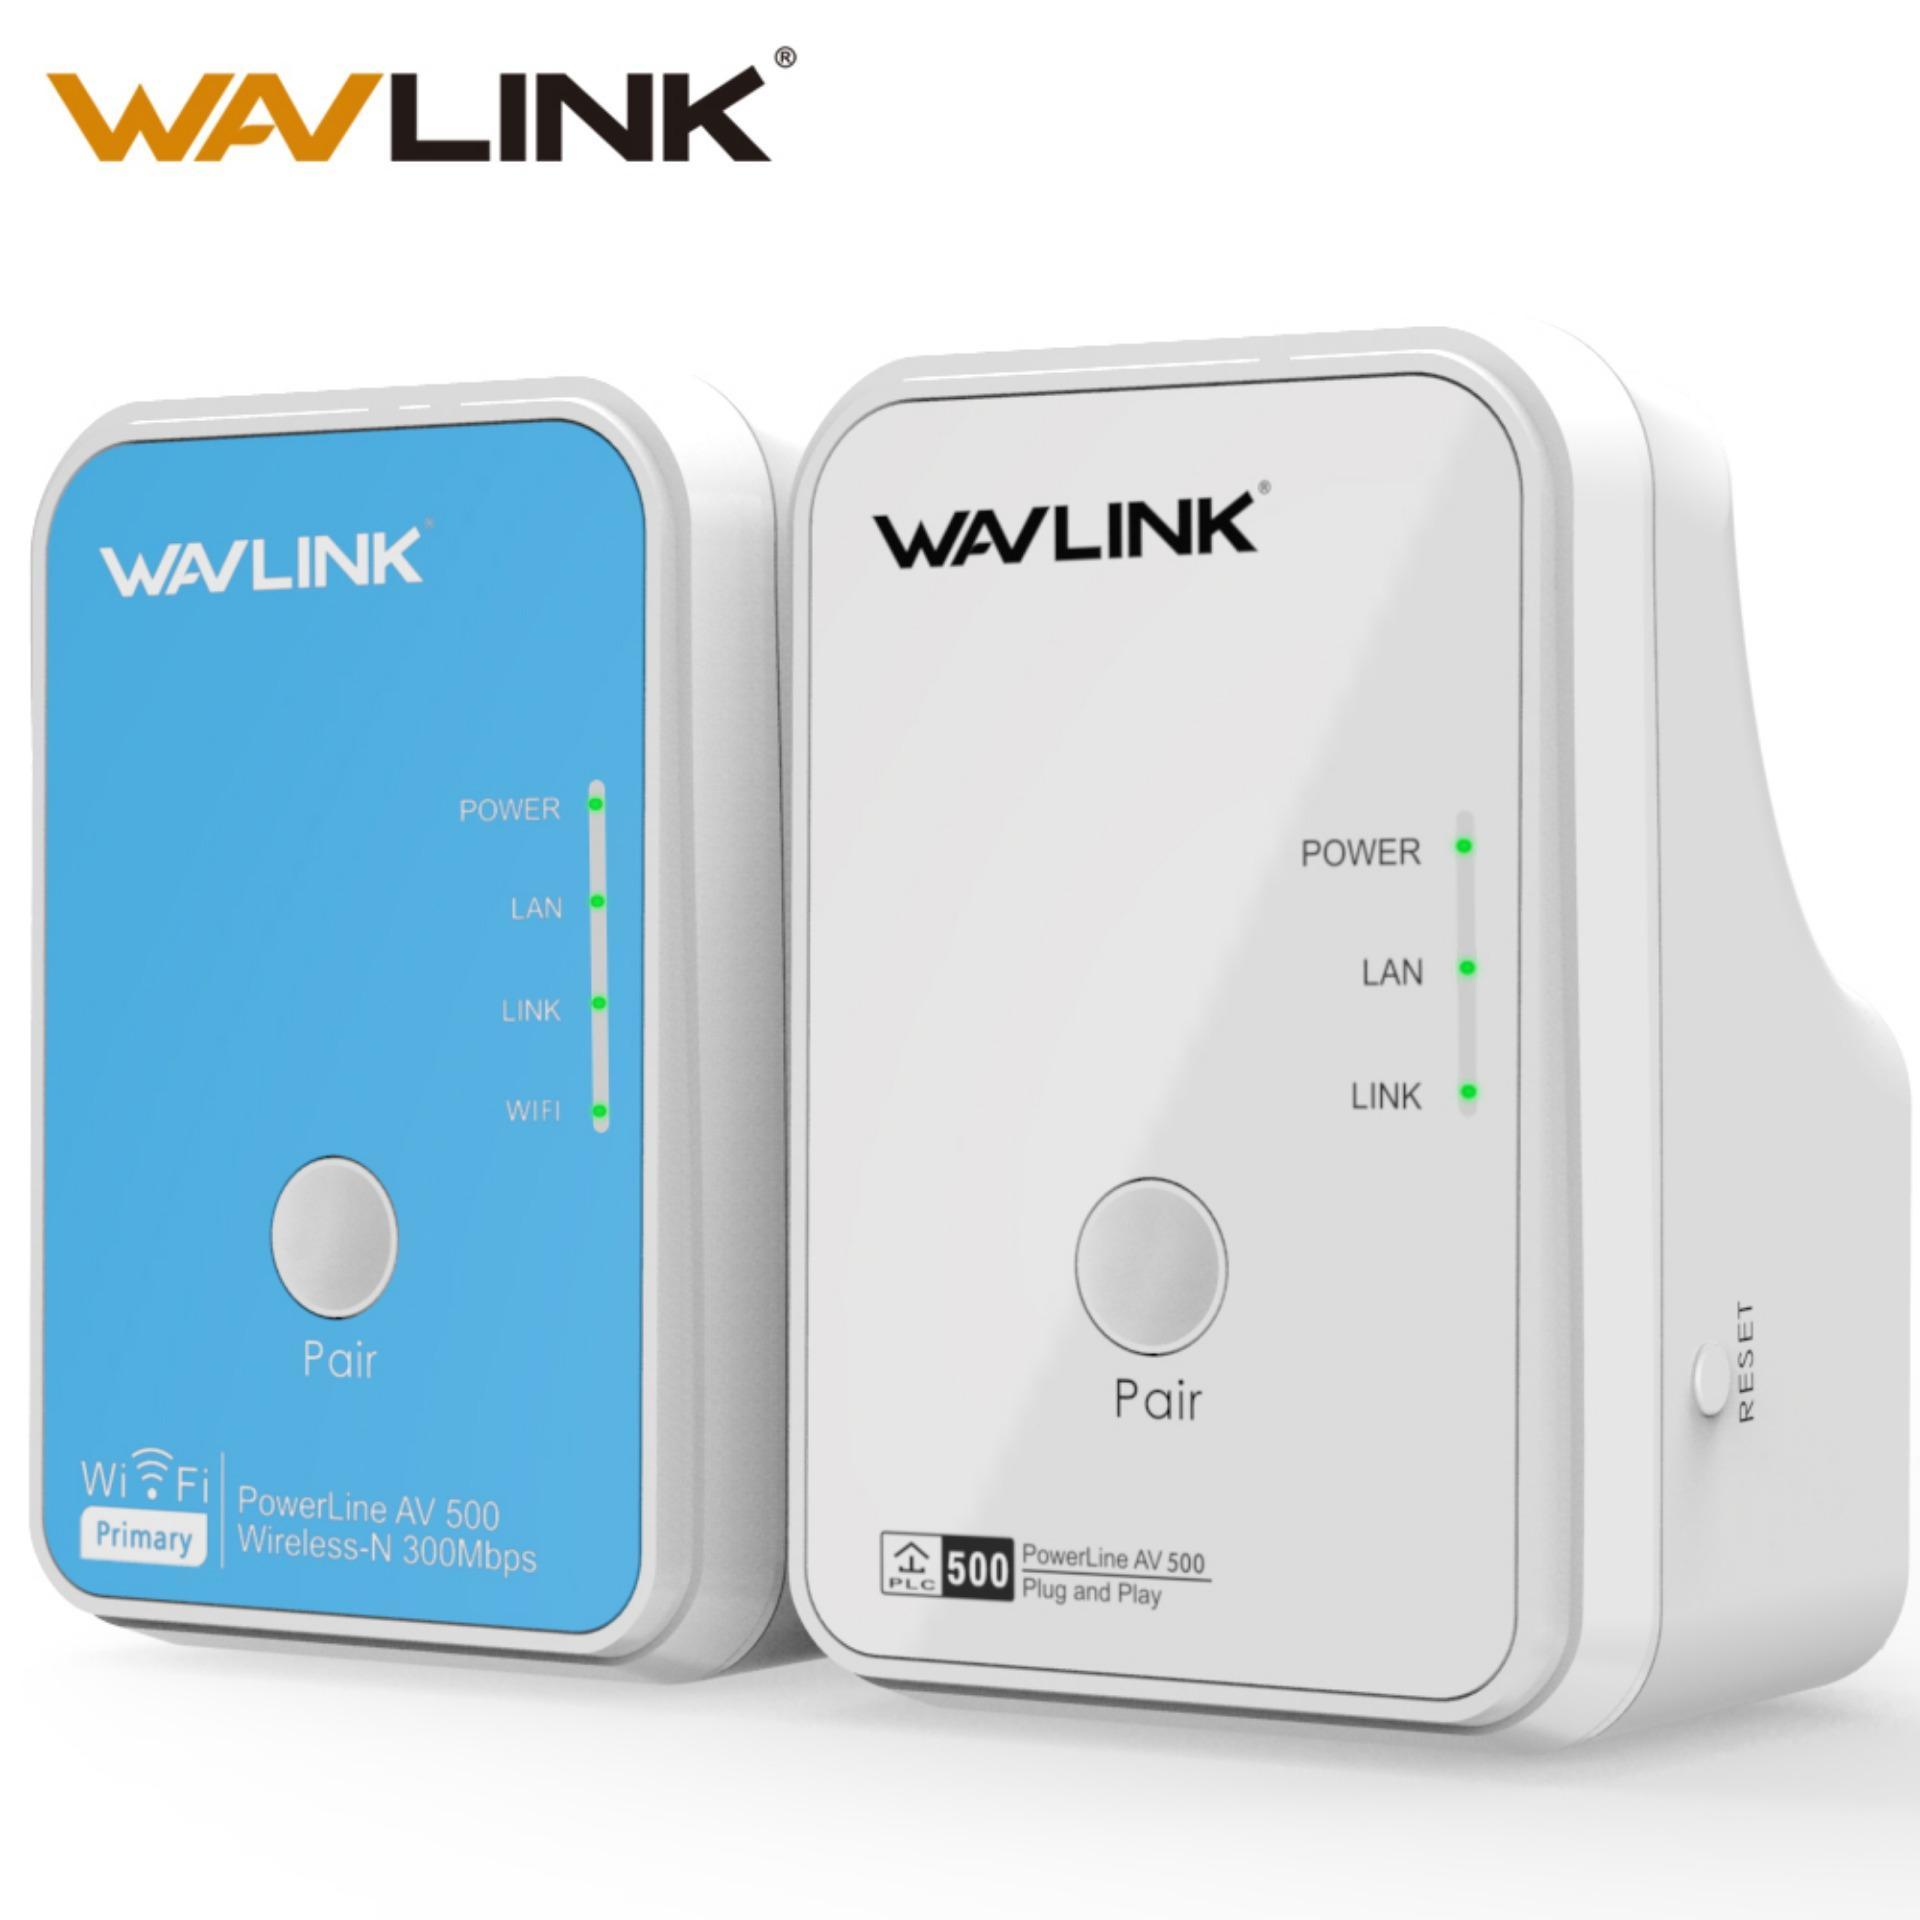 Wi-Fi N300 + Powerline AV500 Edition Kit